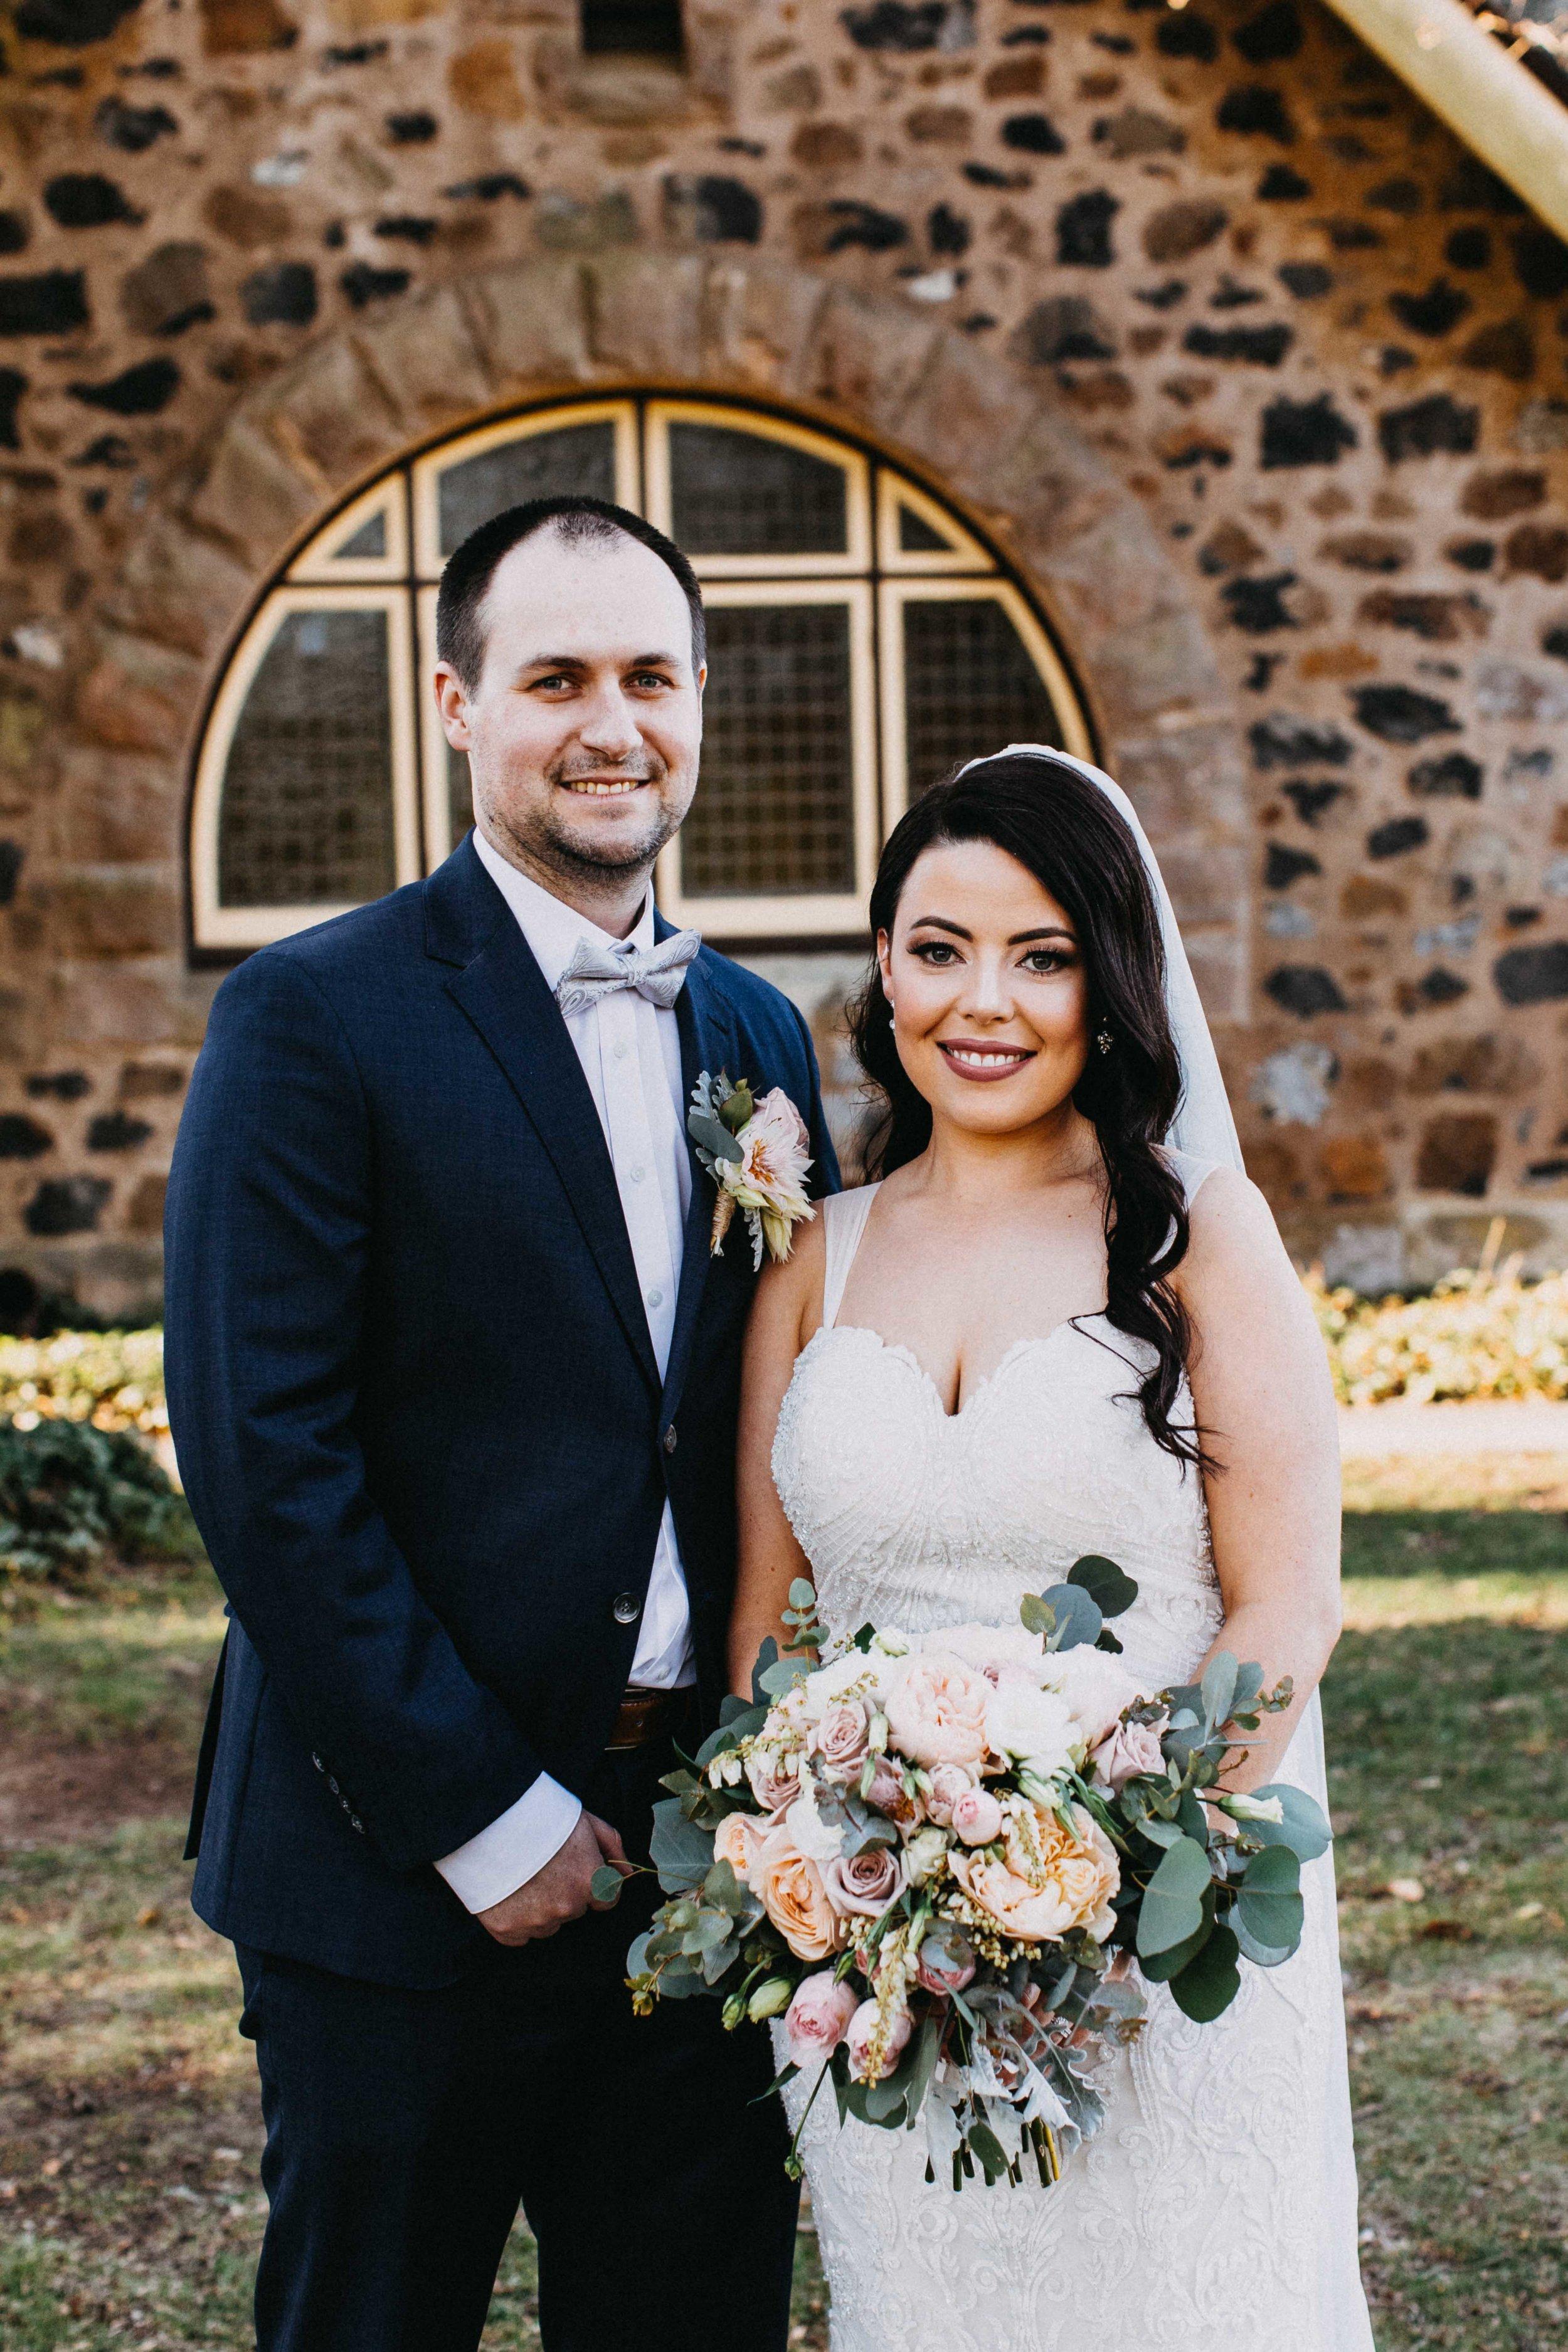 exeter-southern-highlands-wedding-www.emilyobrienphotography.net -100.jpg